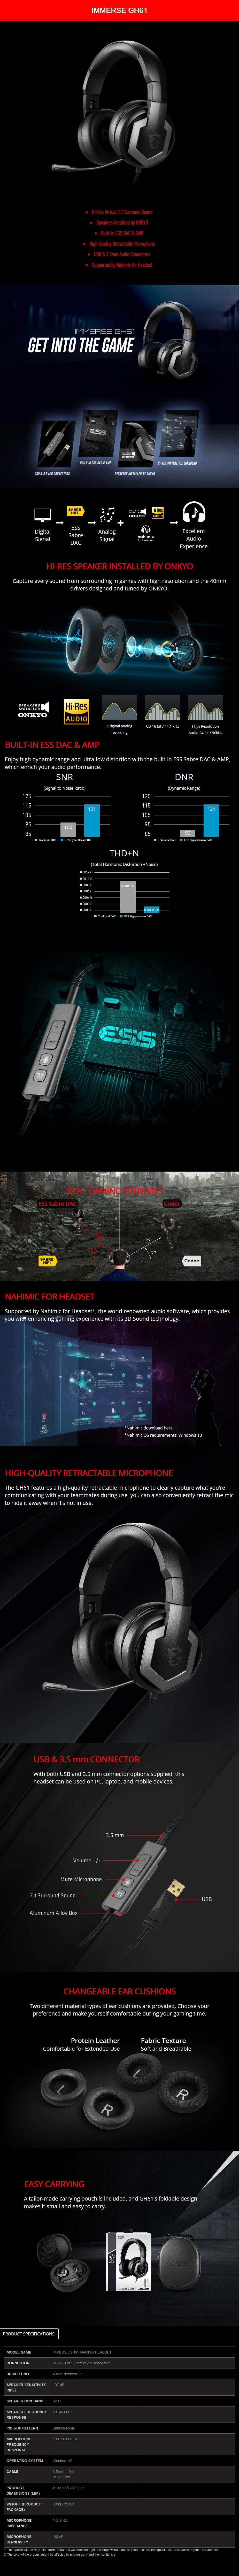 msi-immerse-gh61-virtual-71-usb35mm-gaming-headset-ac39654-5.jpg